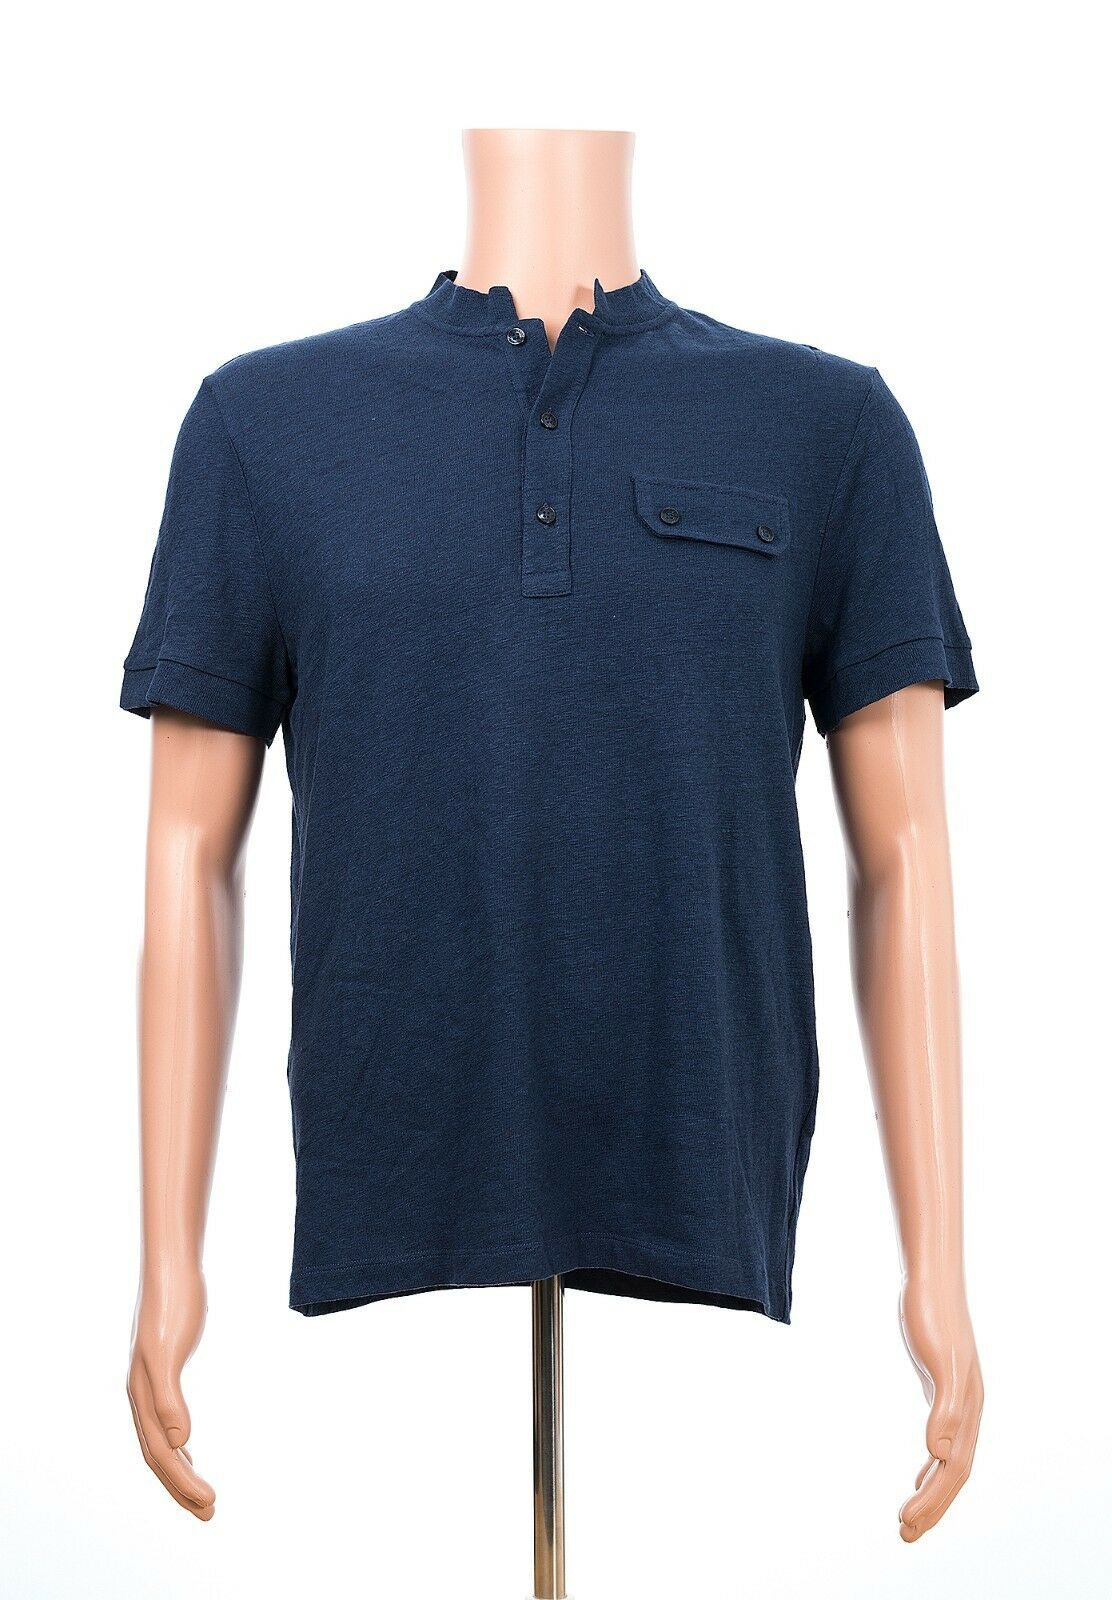 New VERSACE COLLECTION Dark Blau Polo Shirt sz M